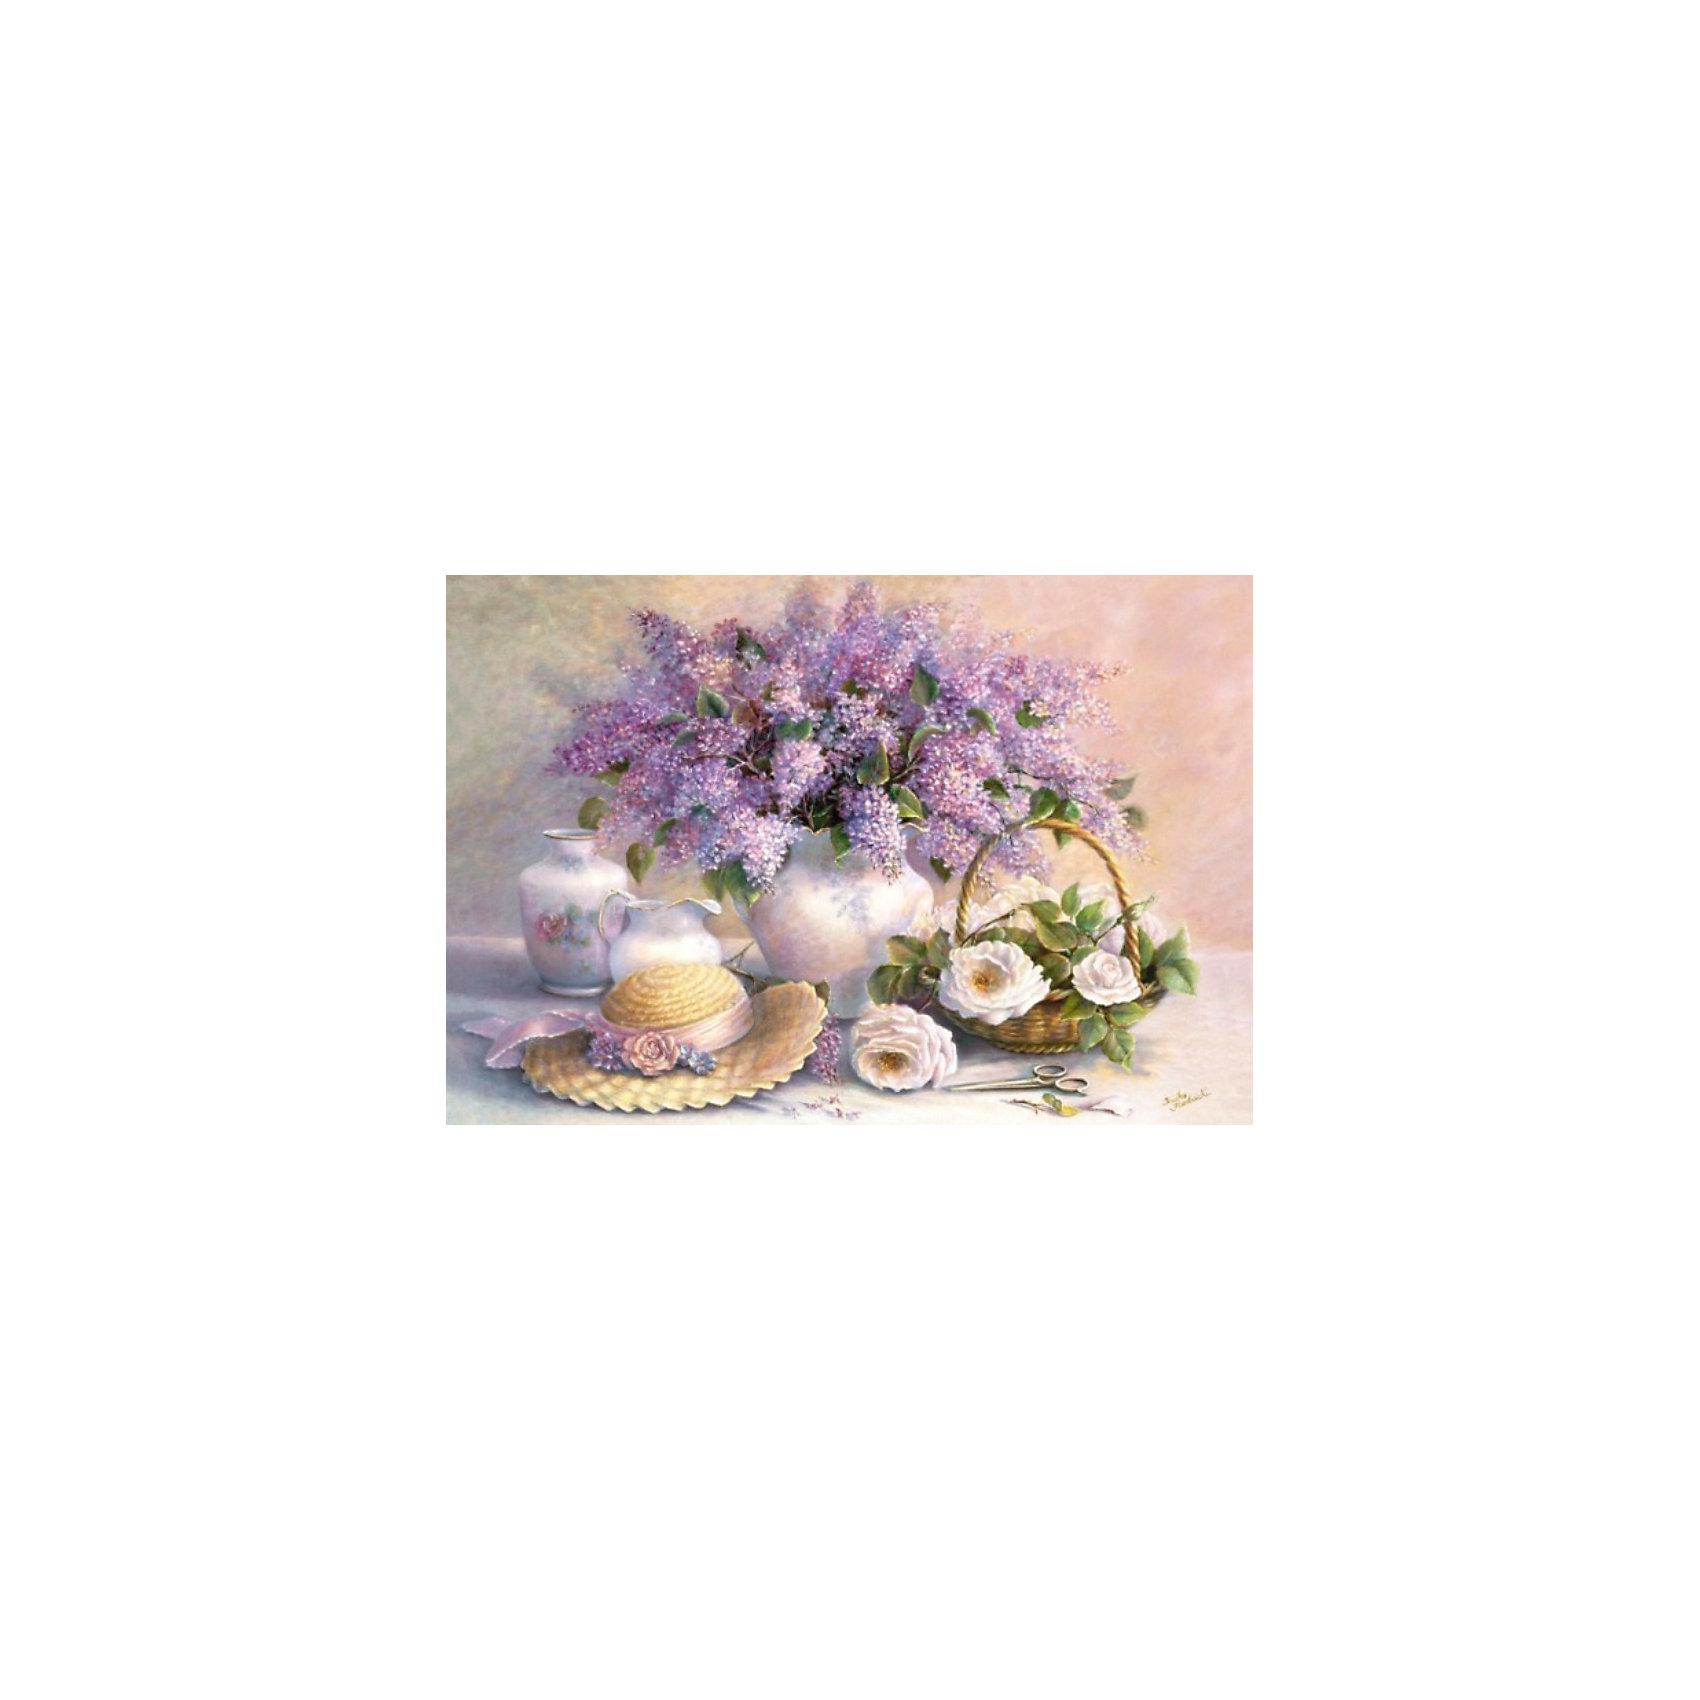 Castorland Пазл Цветы, 1000 деталей, Castorland пазл для раскрашивания арт терапия царь зверей origami 360 деталей